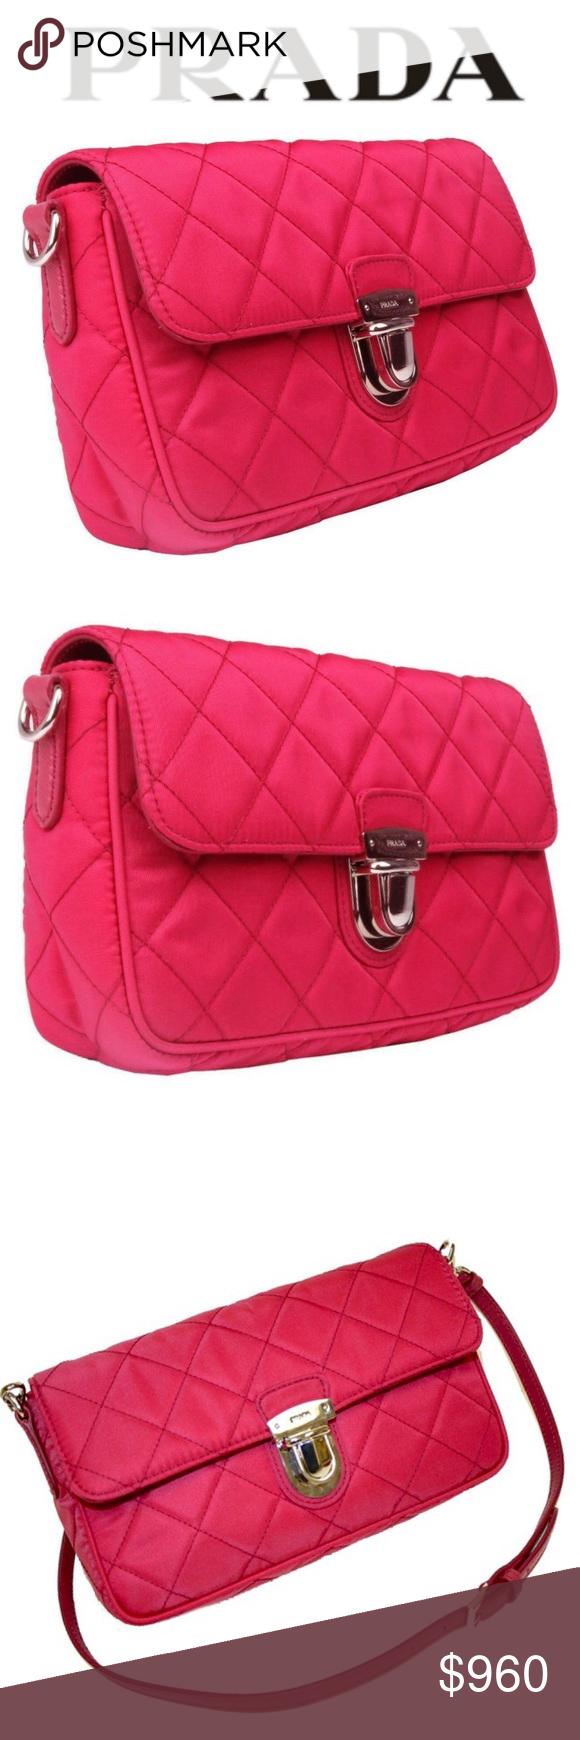 4f37b8f1854e62 ✦NEW PRADA Pink Quilted Shoulder Bag✦ ✦NEW PRADA Tessuto Impuntu Pattina  Quilted Nylon